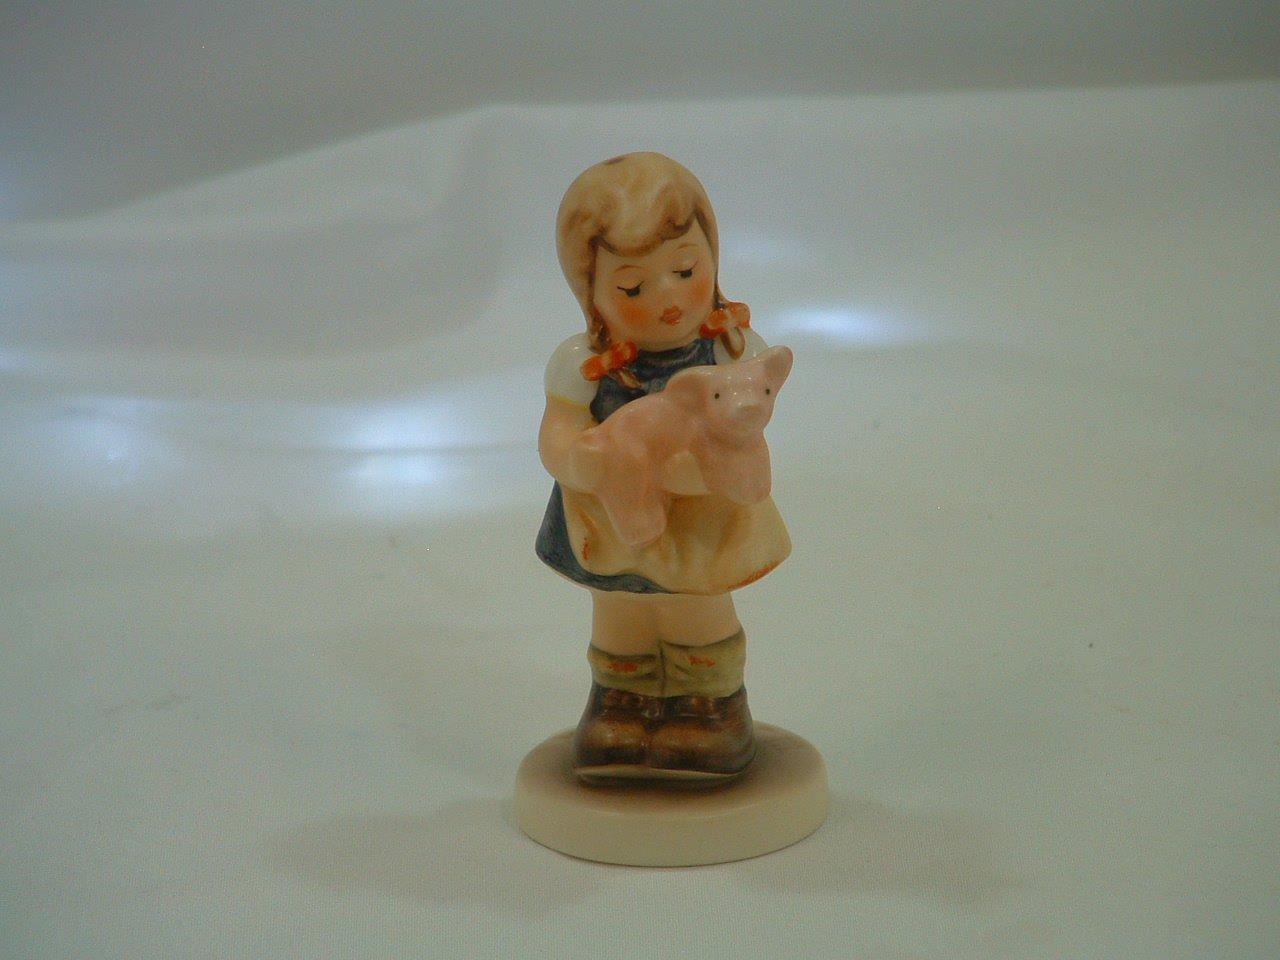 Hummel Goebel Germany Pigtails Figurine in Box